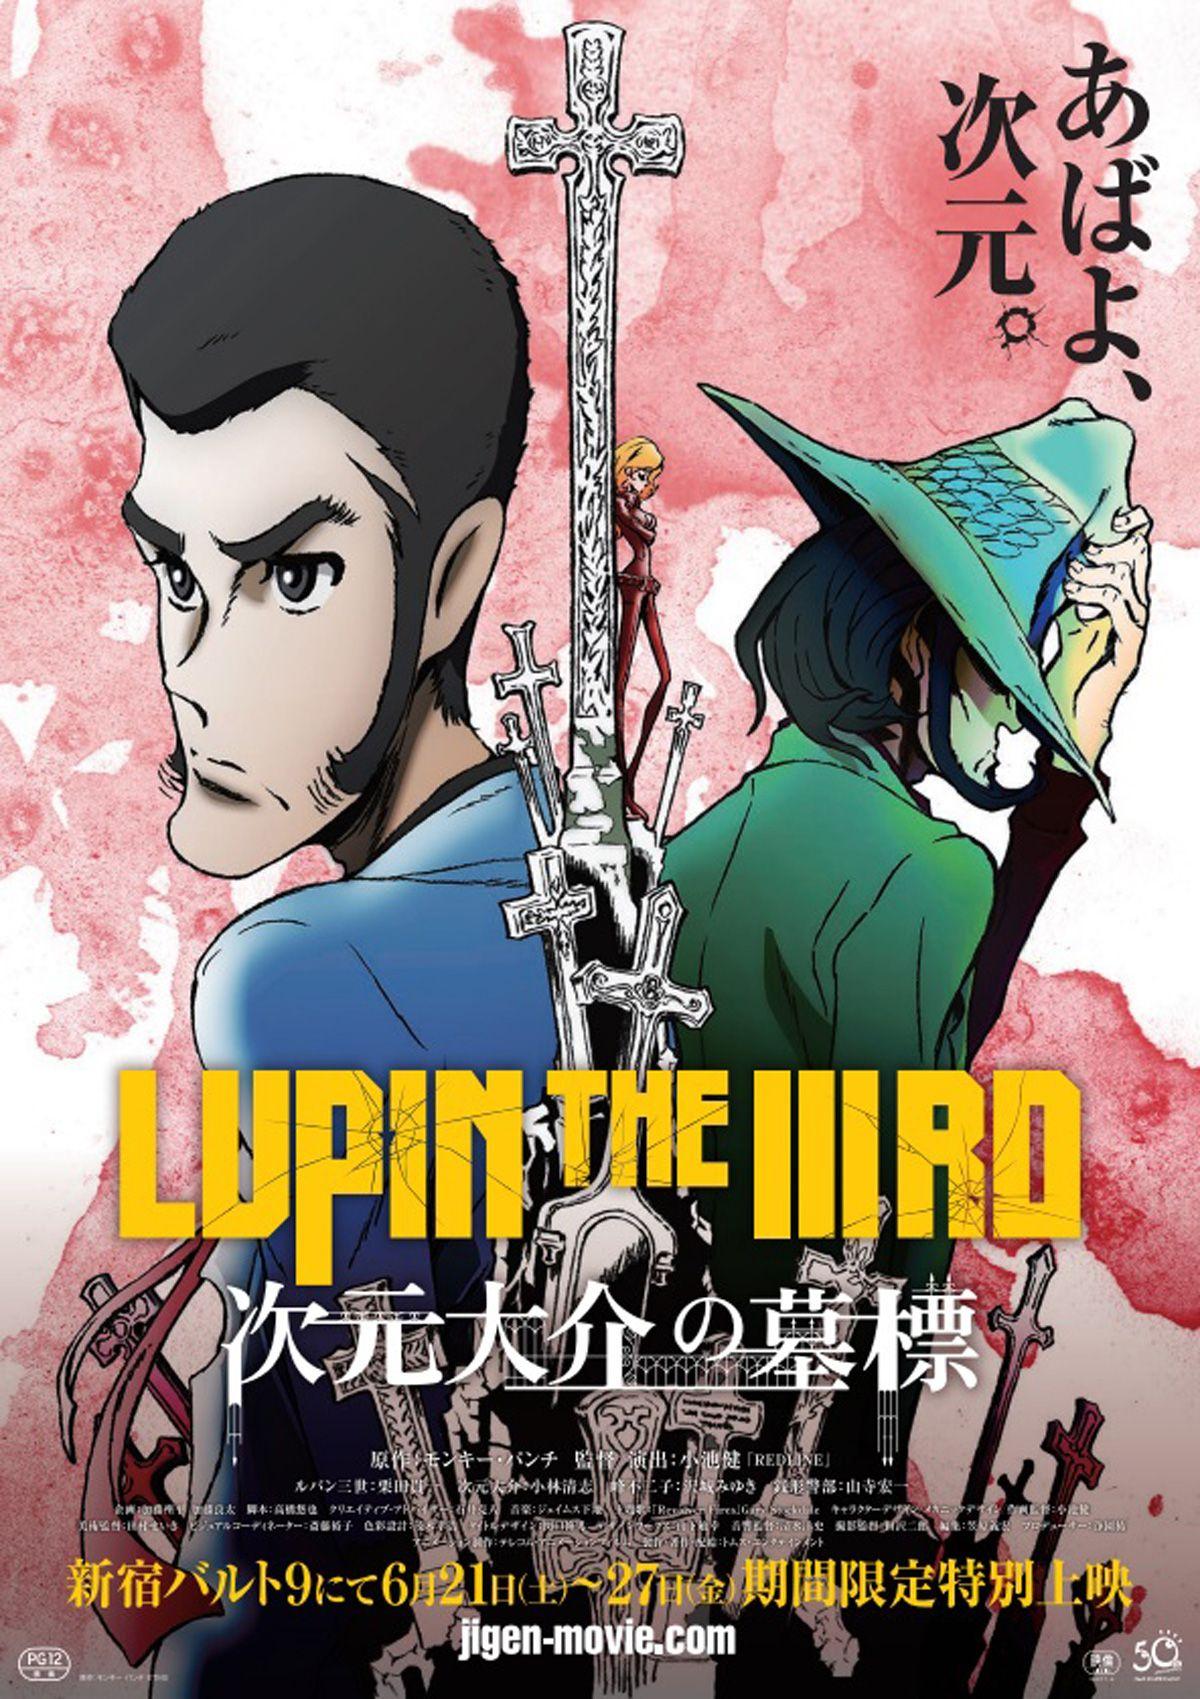 Lupin The Iiird 次元大介の墓標 作品 Yahoo 映画 次元大介 Akira アキラ 映画